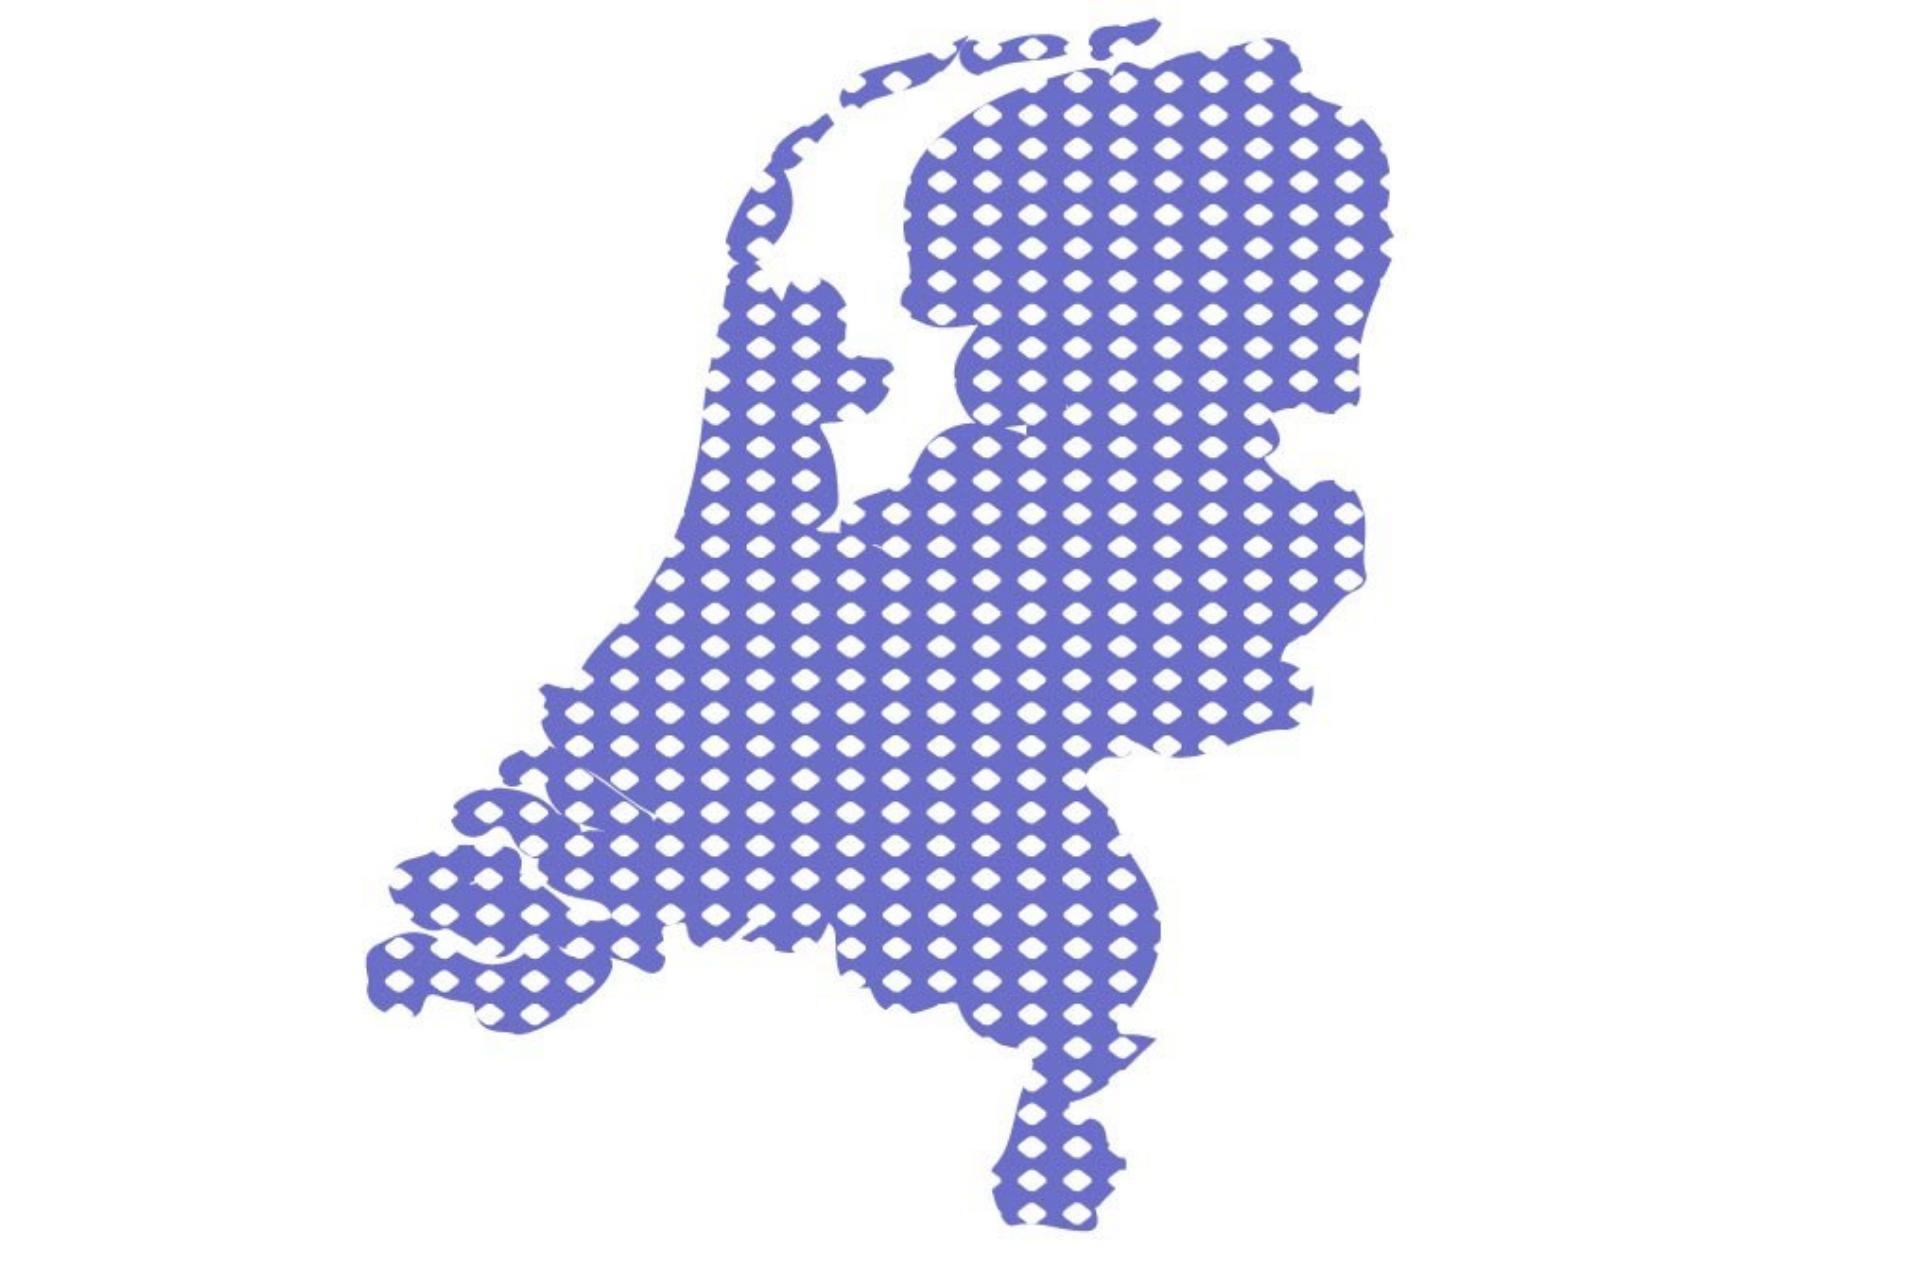 holandeses que usan Viagra